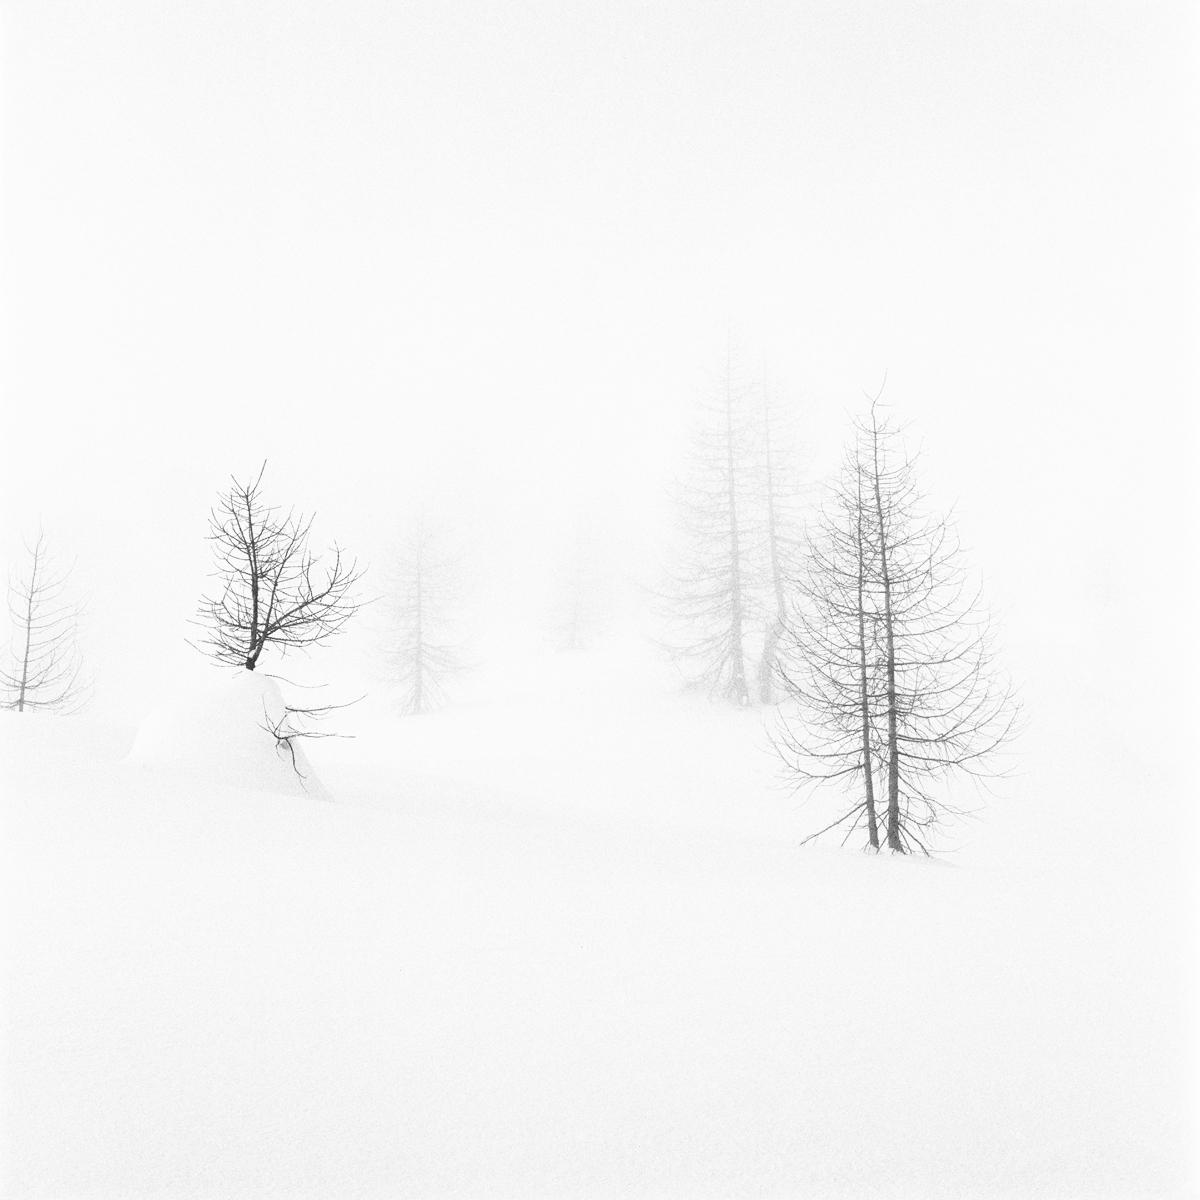 020 | Hasselblad 501C | ©AlbertoBregani